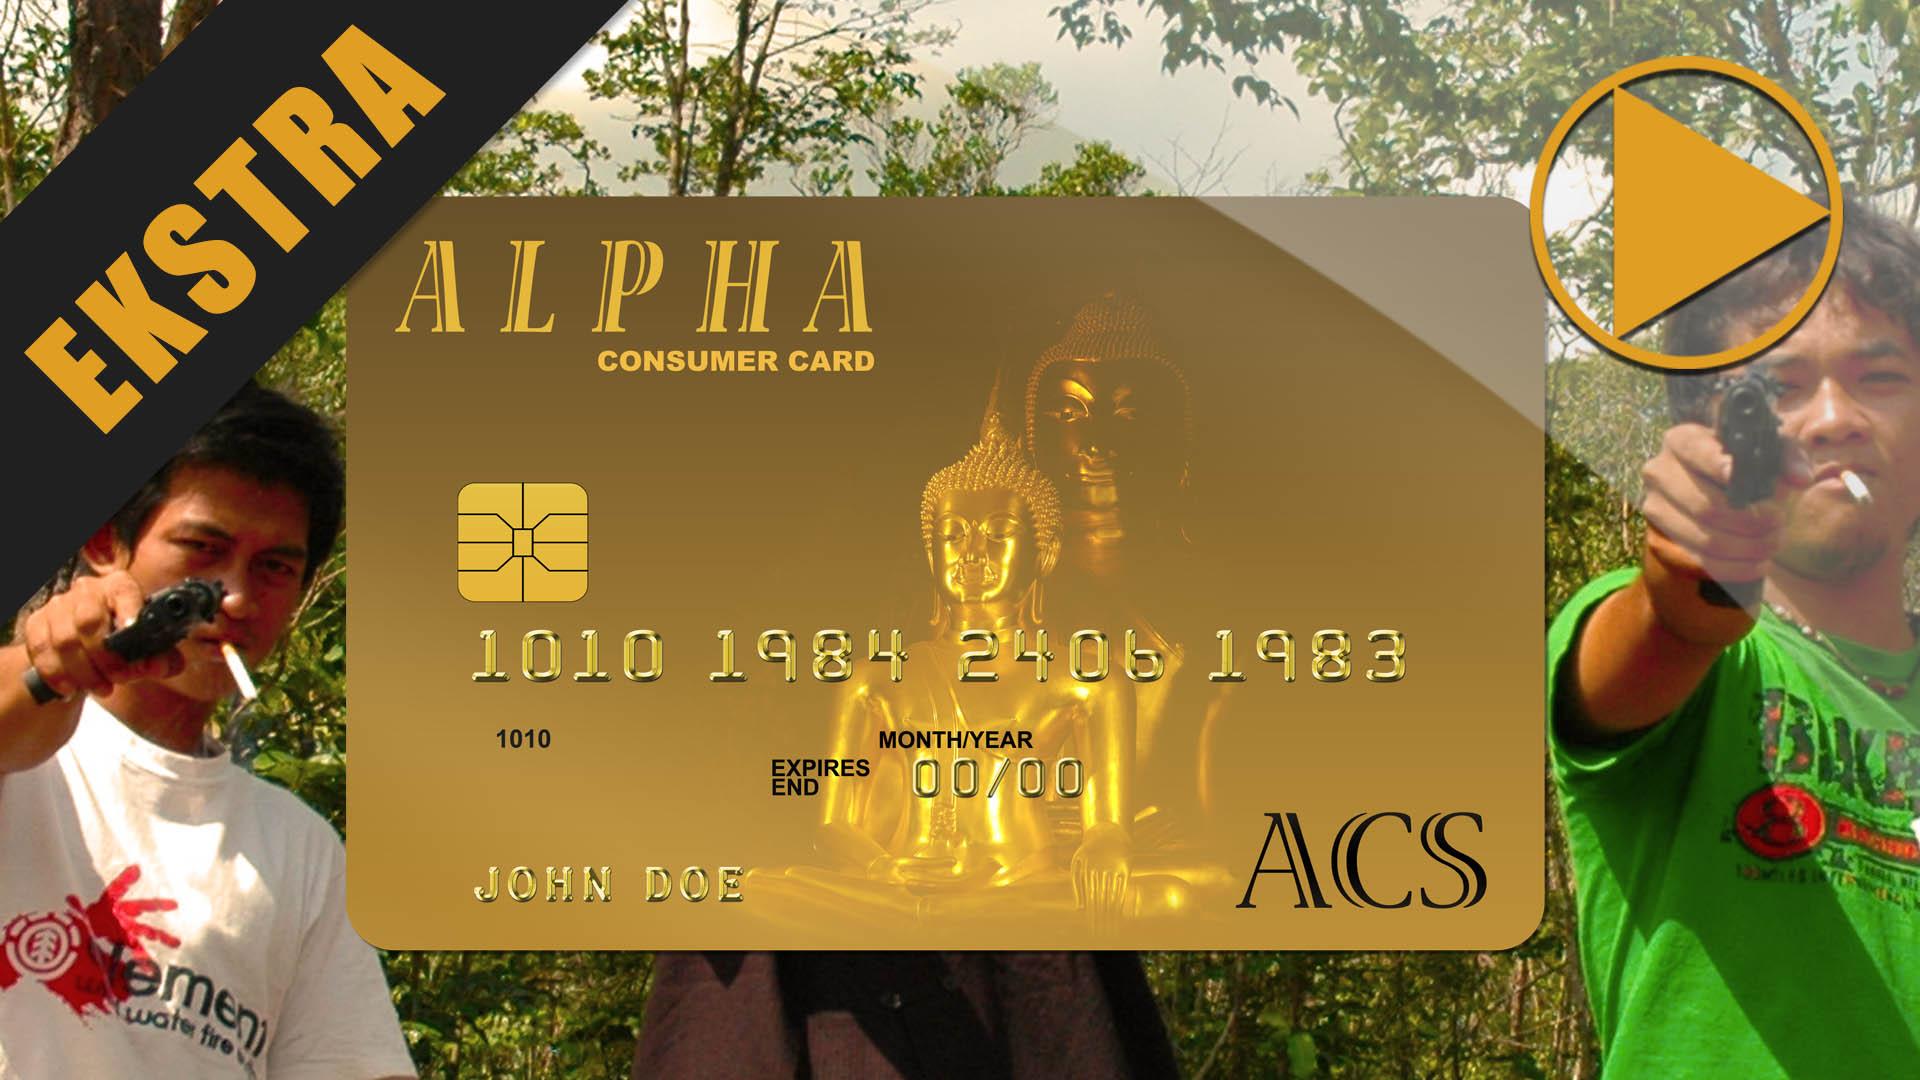 Alpha Consumer Card #2